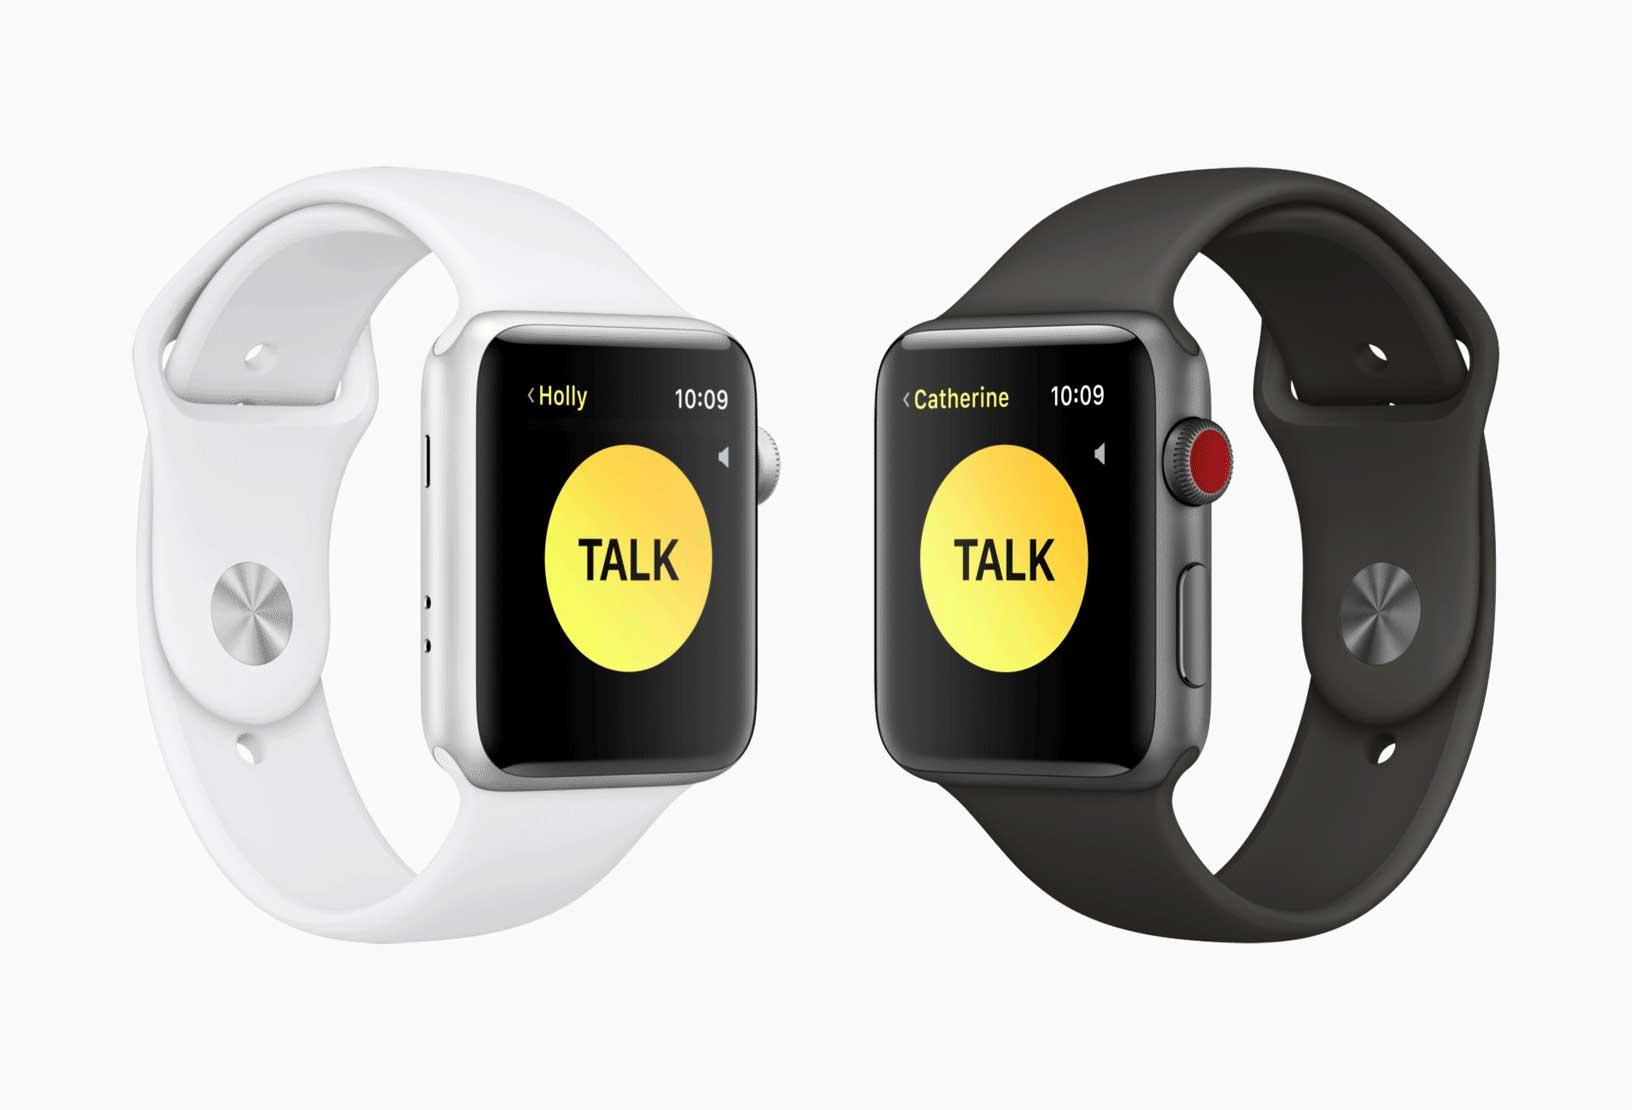 Apple、WWDCで「WatchOS 5」を発表!予想以上の大幅なアップデートへ